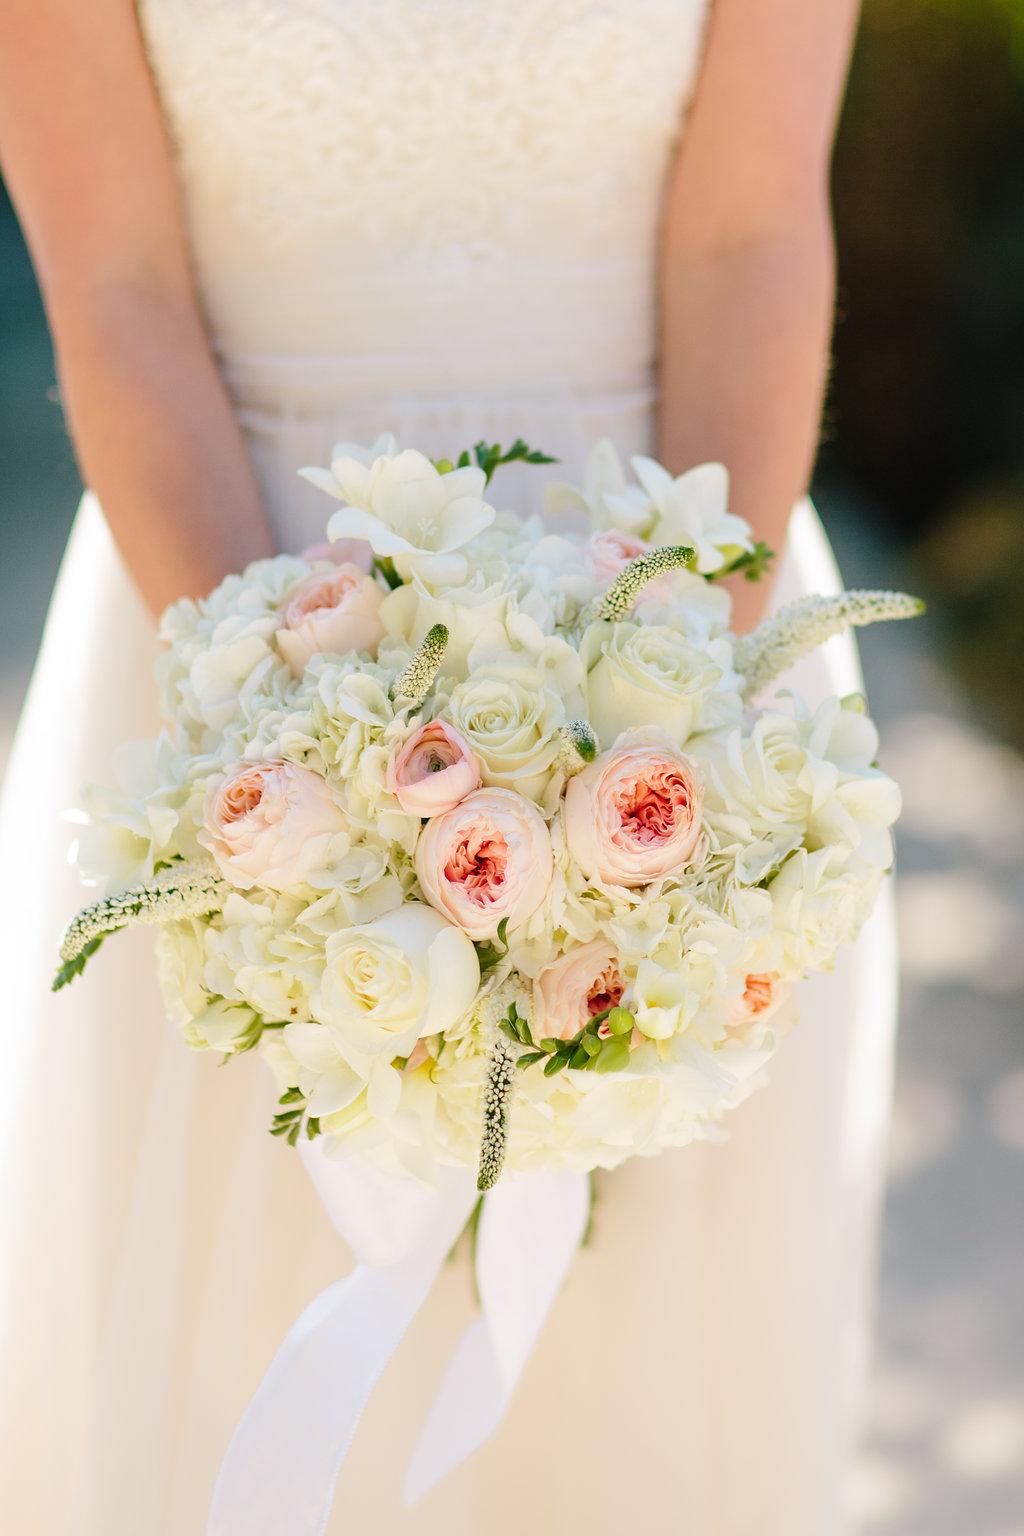 Kellylemonphotography_lucy+kento_weddingpreviews-20.jpg